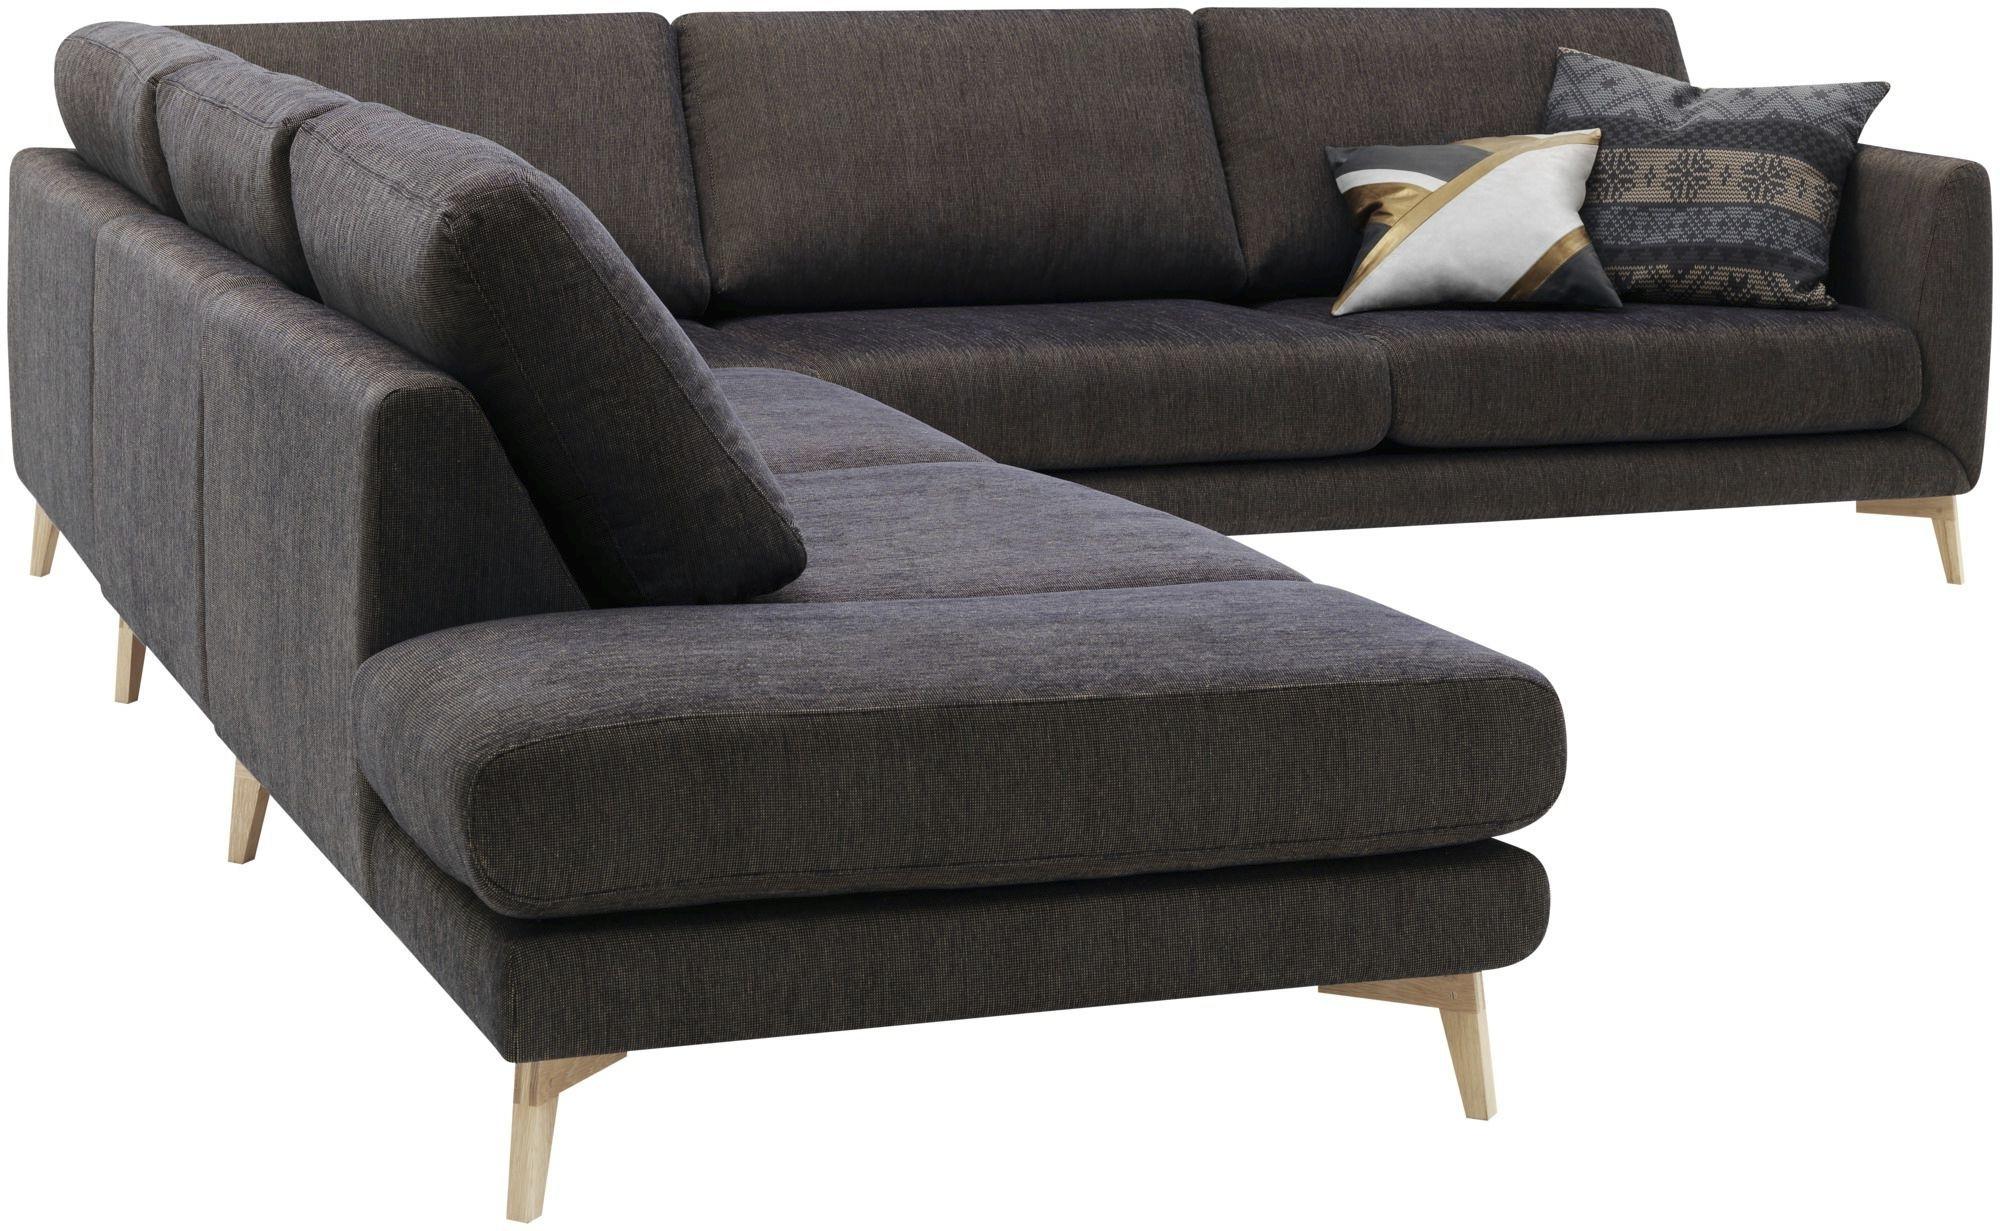 Latest Modular Corner Sofas For Corner Sofa / Modular / Contemporary / Leather – Fargoanders (View 10 of 20)